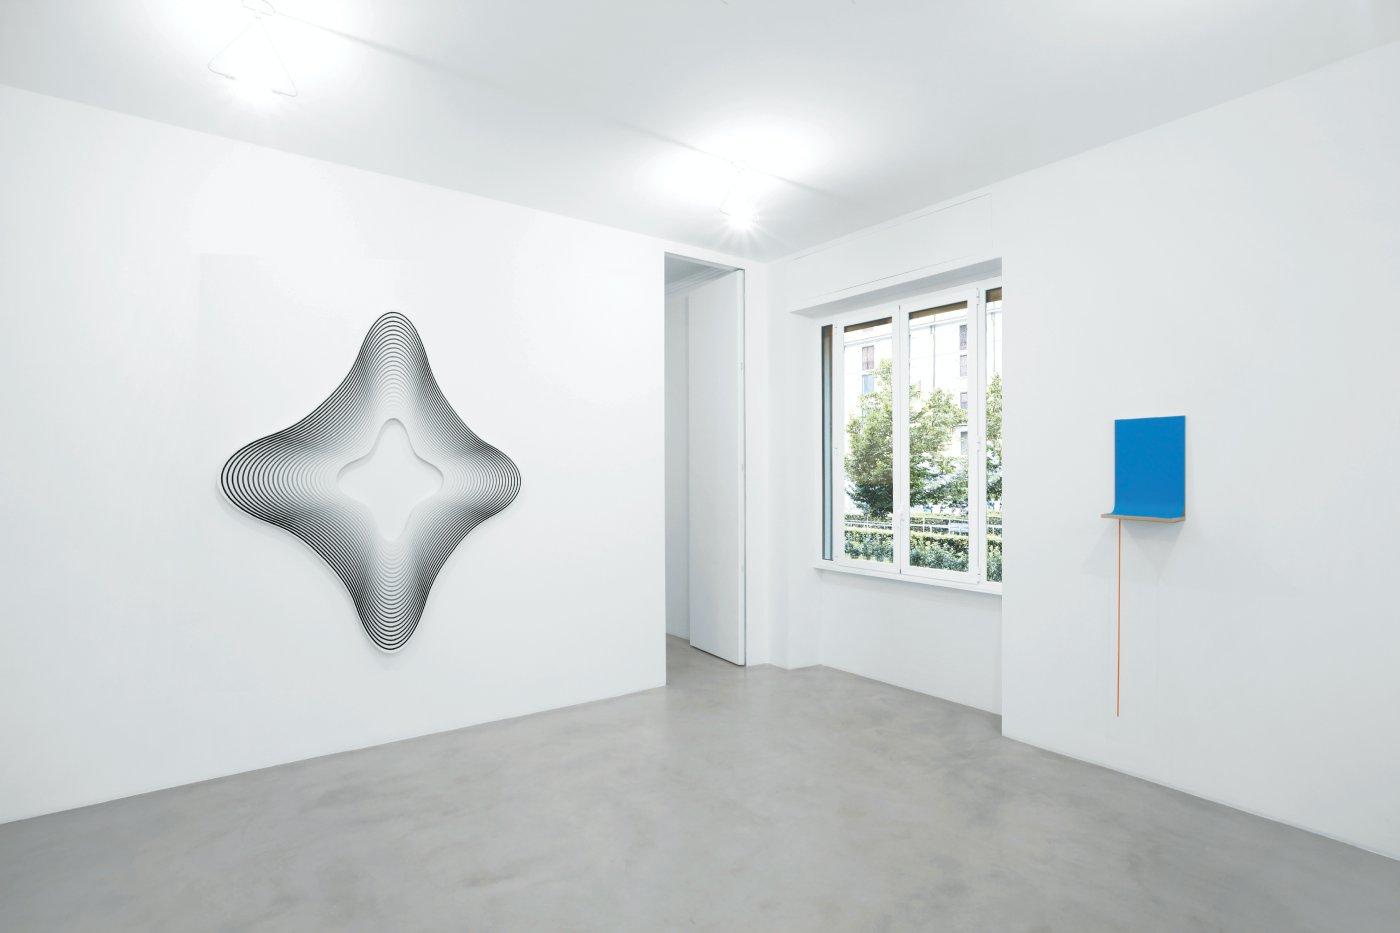 A Arte Invernizzi Sensitive spaces 4